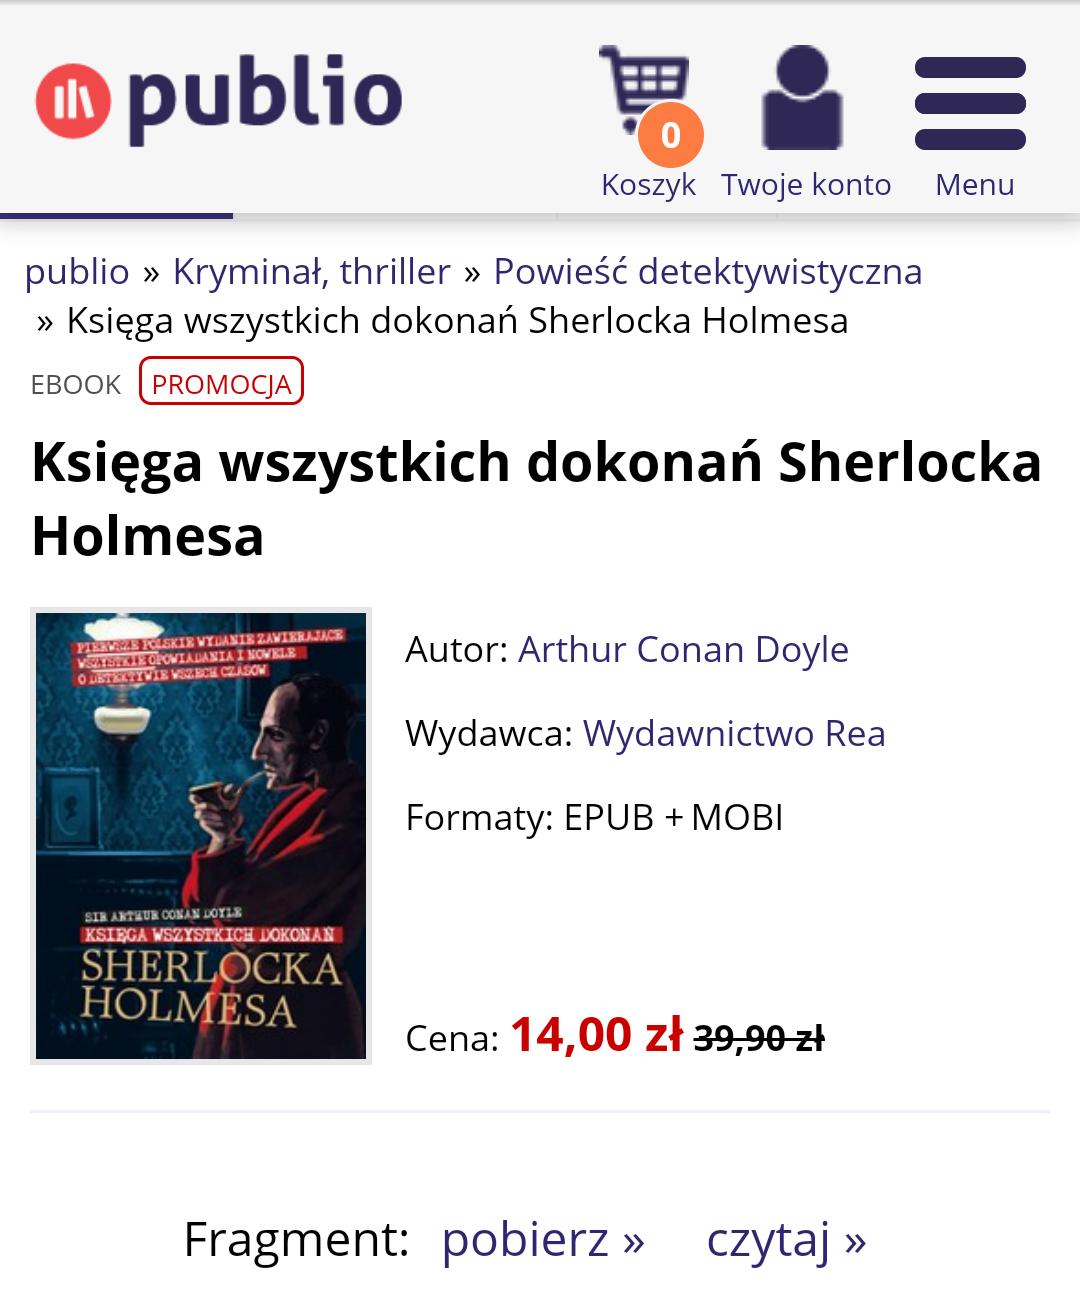 E-book  Sherlock Holmes